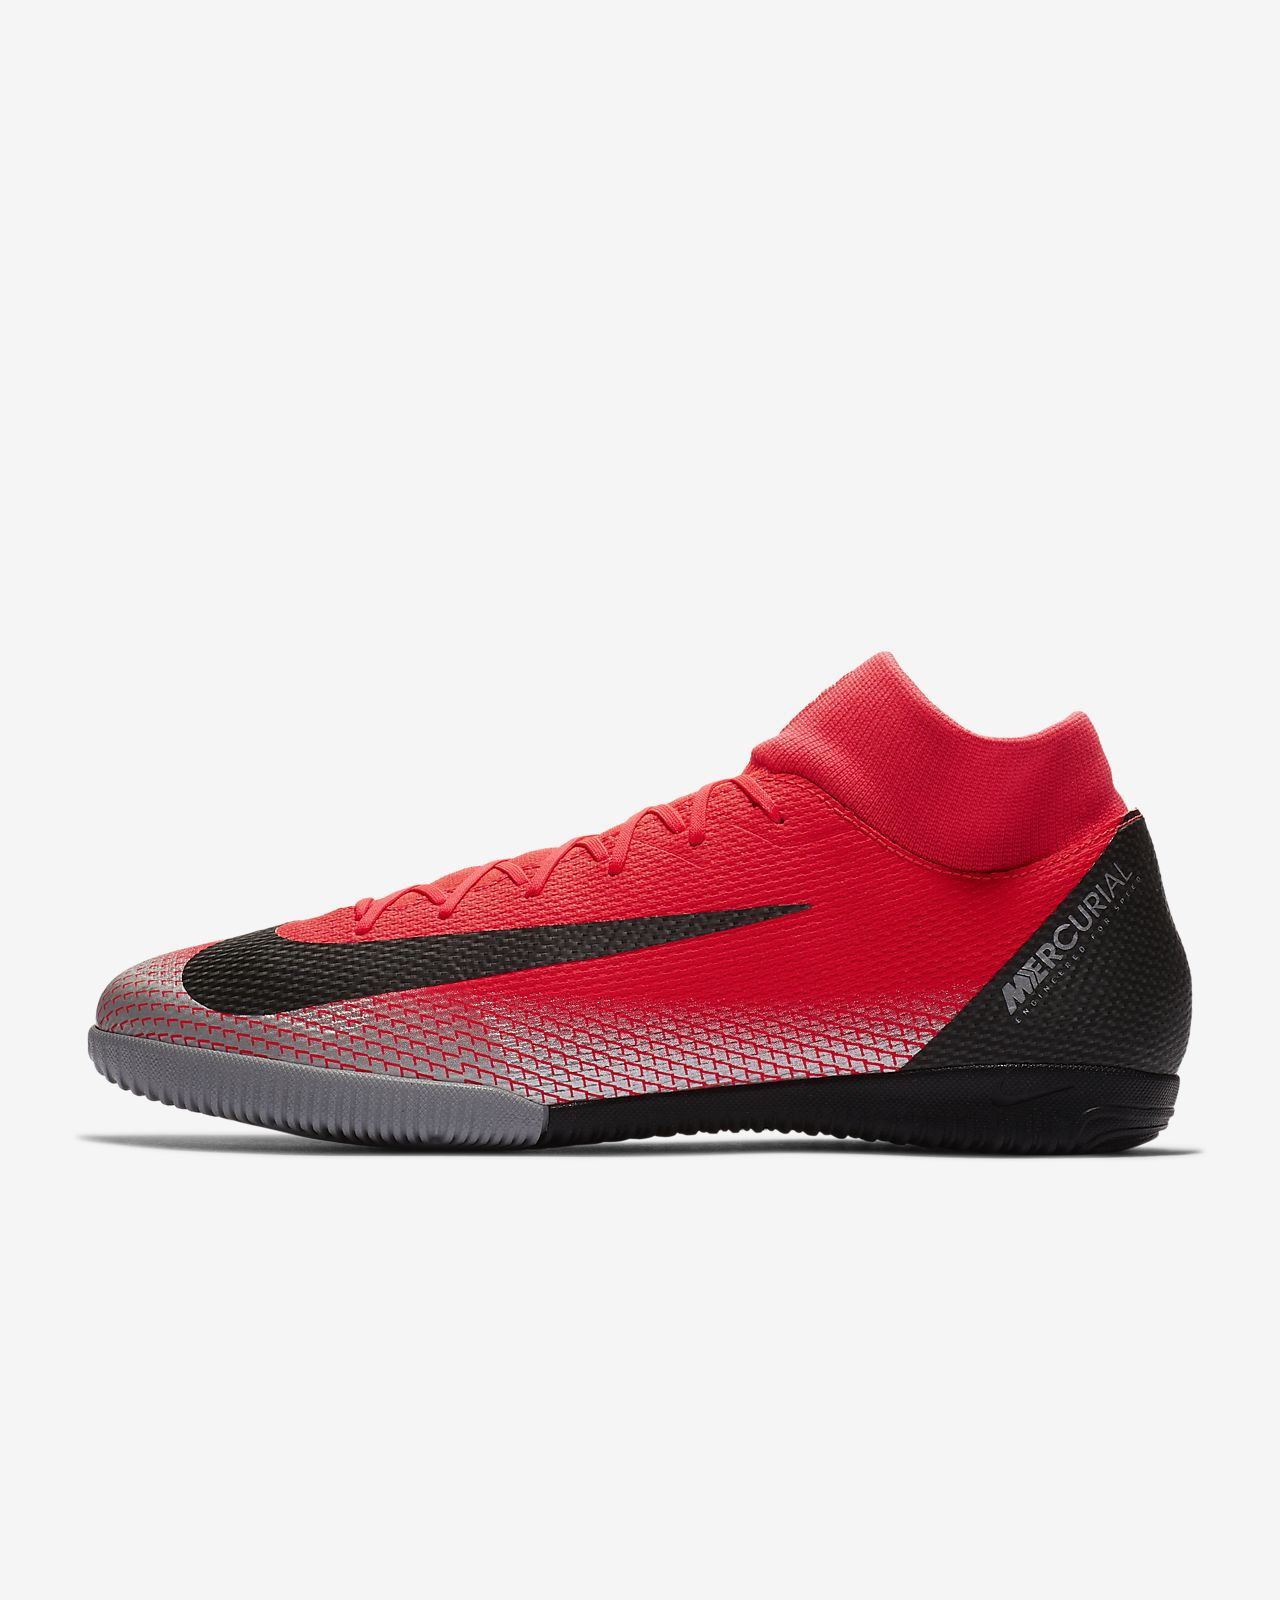 9d648eb075 Sapatilhas de futsal Nike MercurialX Superfly VI Academy CR7 IC ...